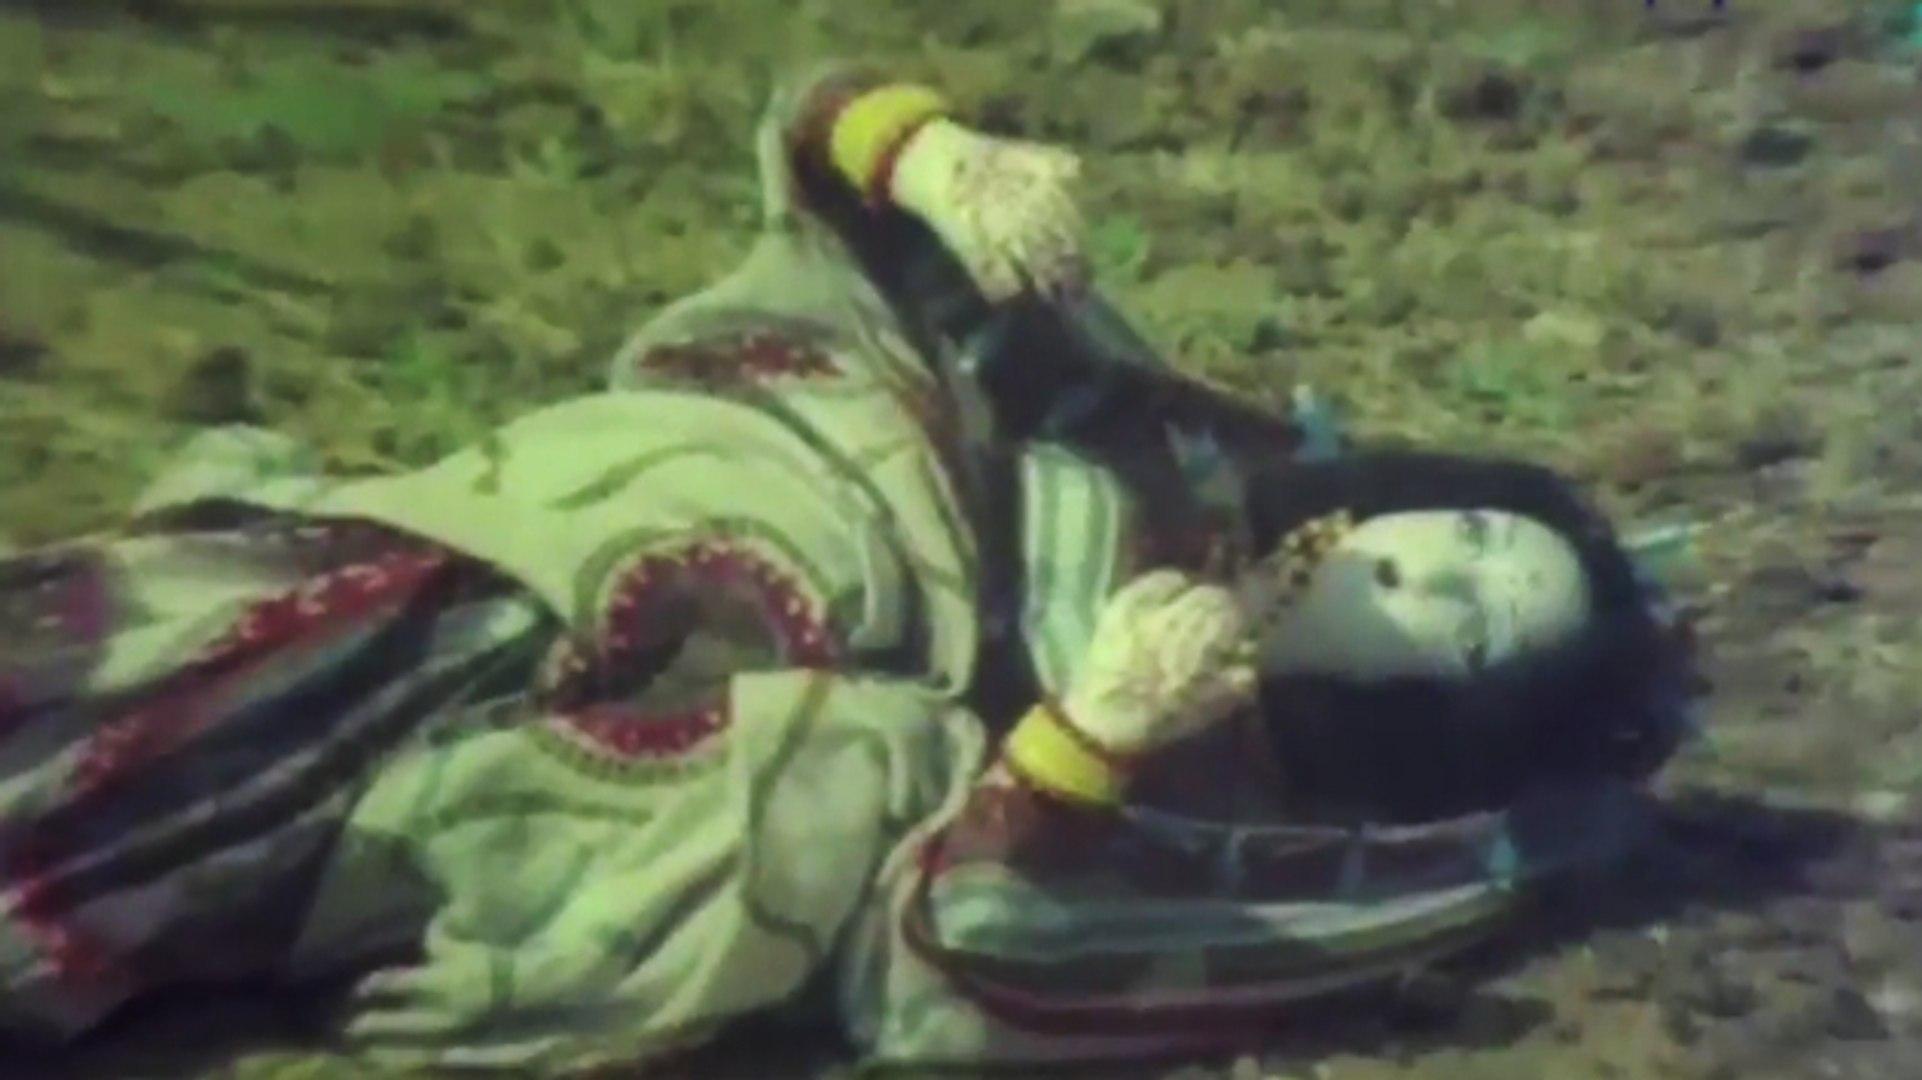 Two Small Boys Fights For a Doll | Oru Ragam Pala Thalam | Malayalam Film